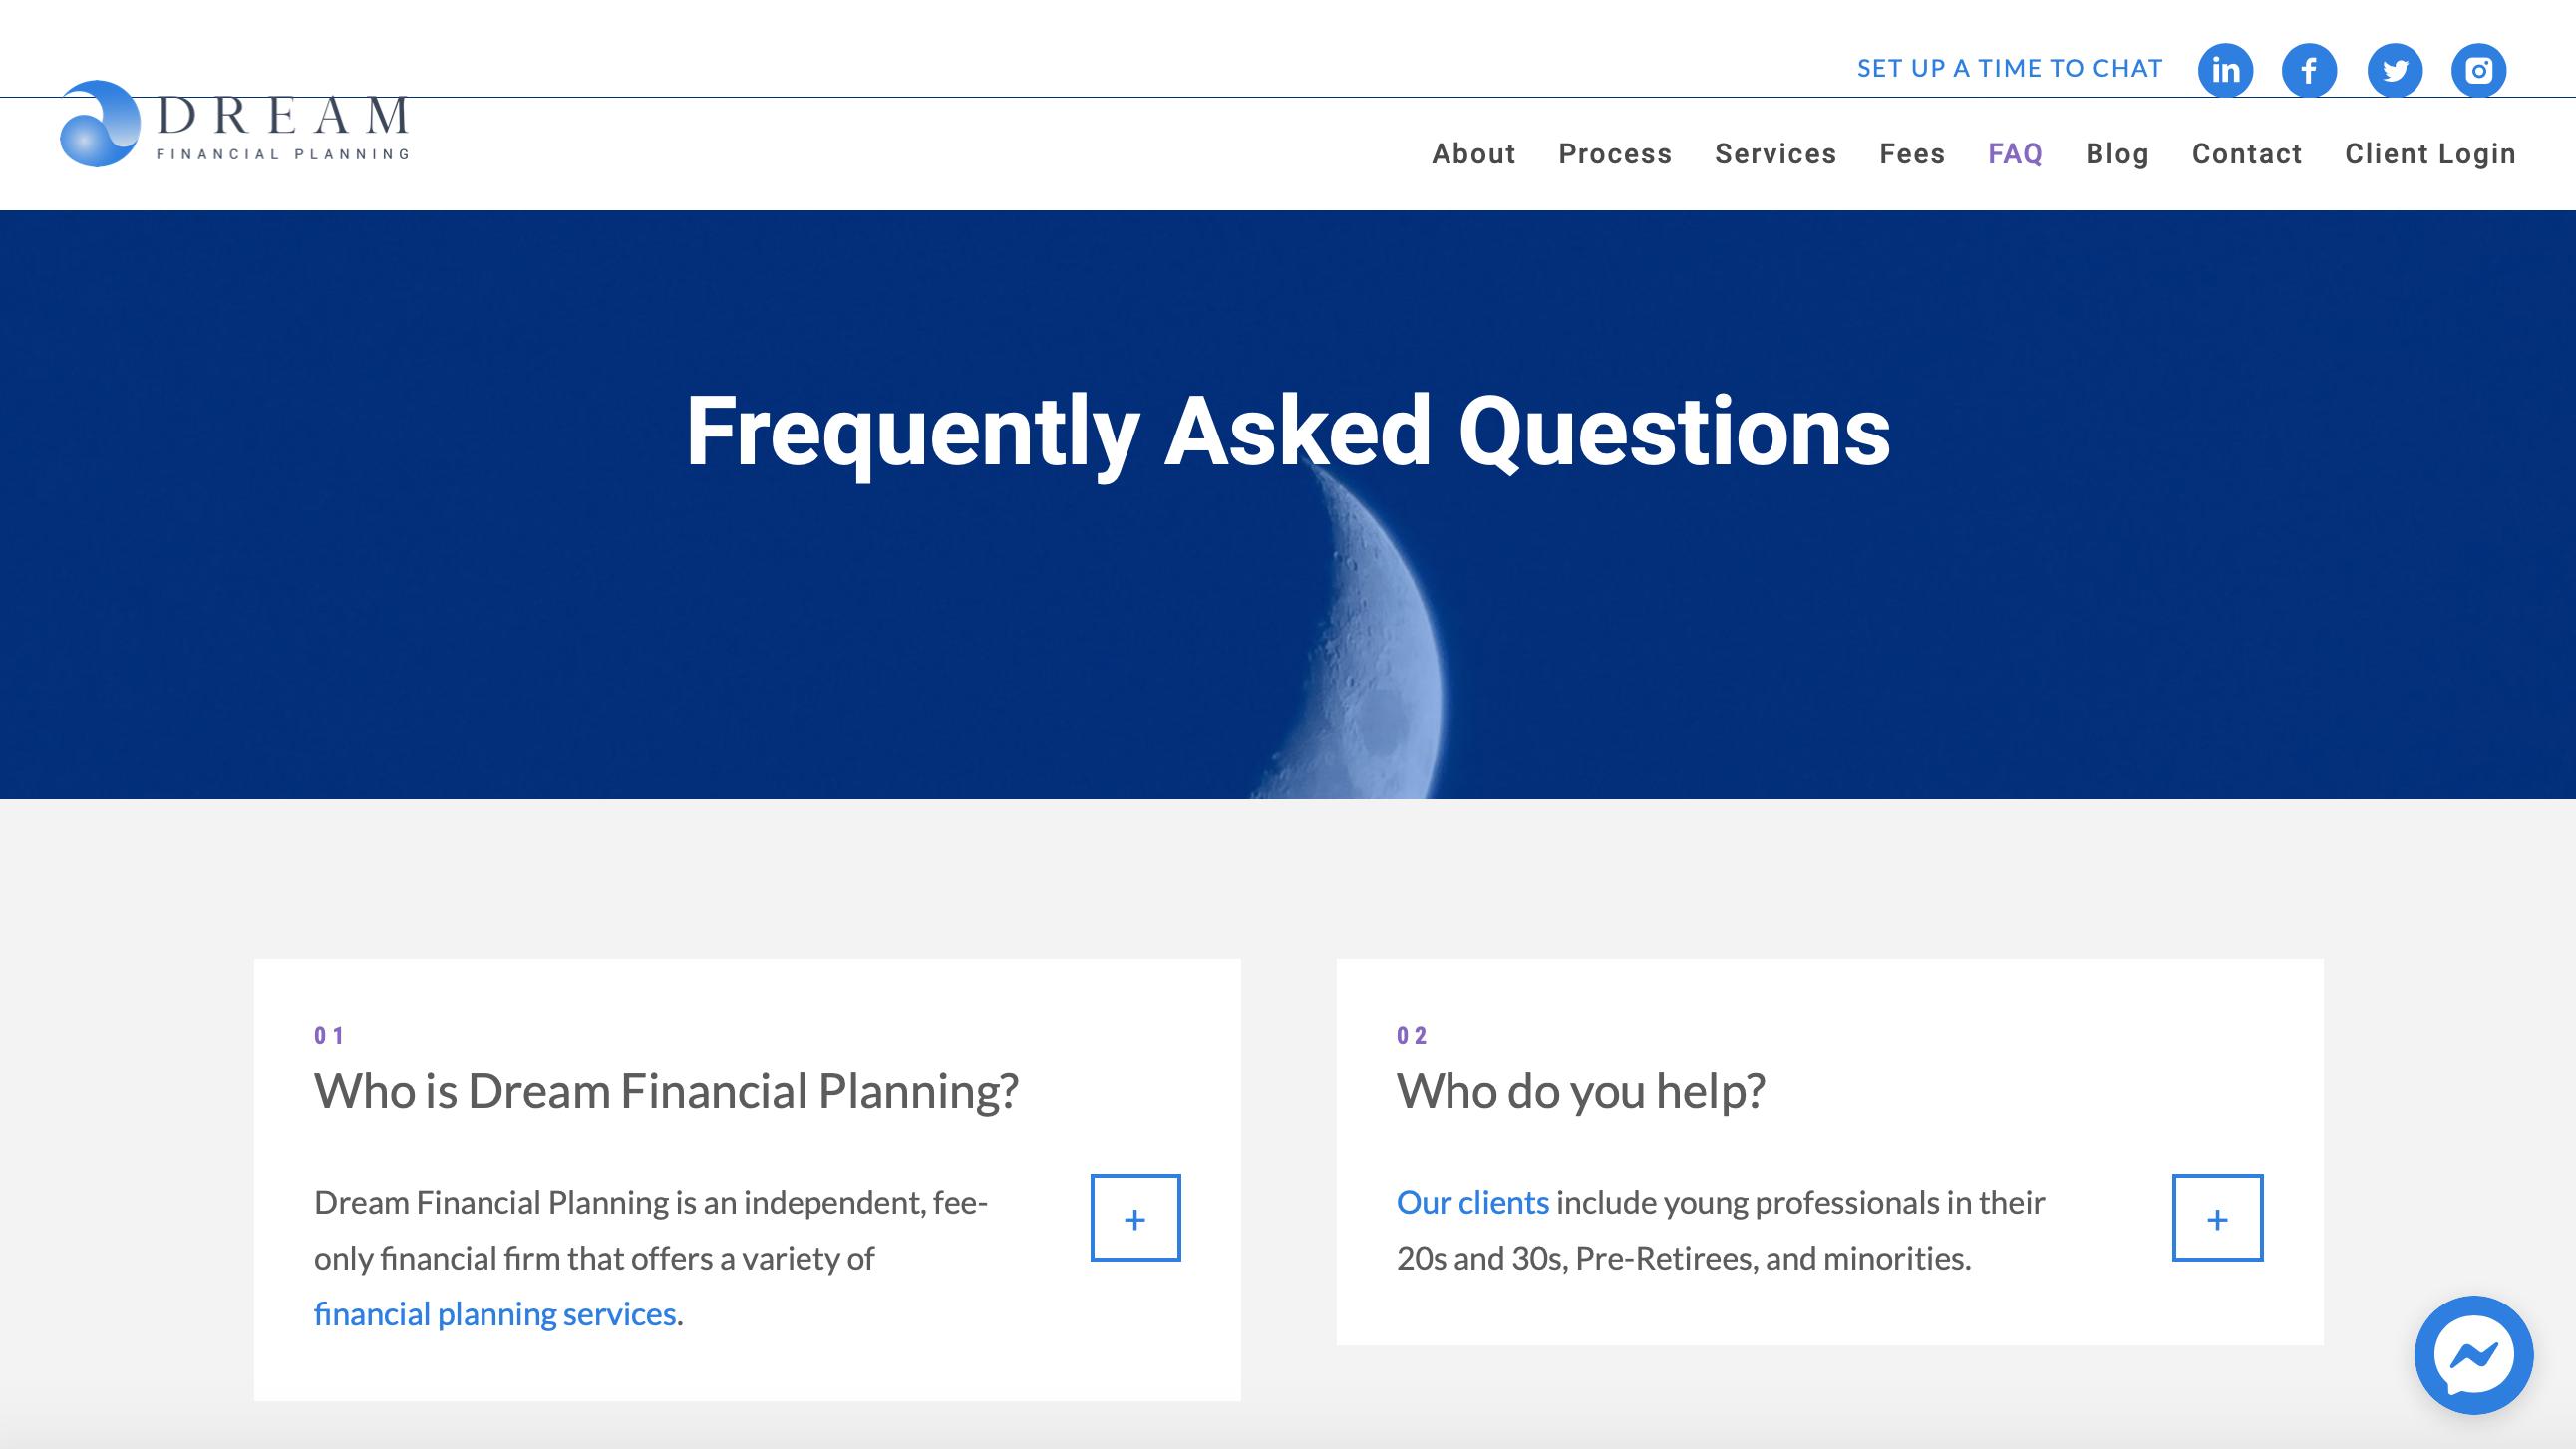 Dream Financial Planning FAQ page